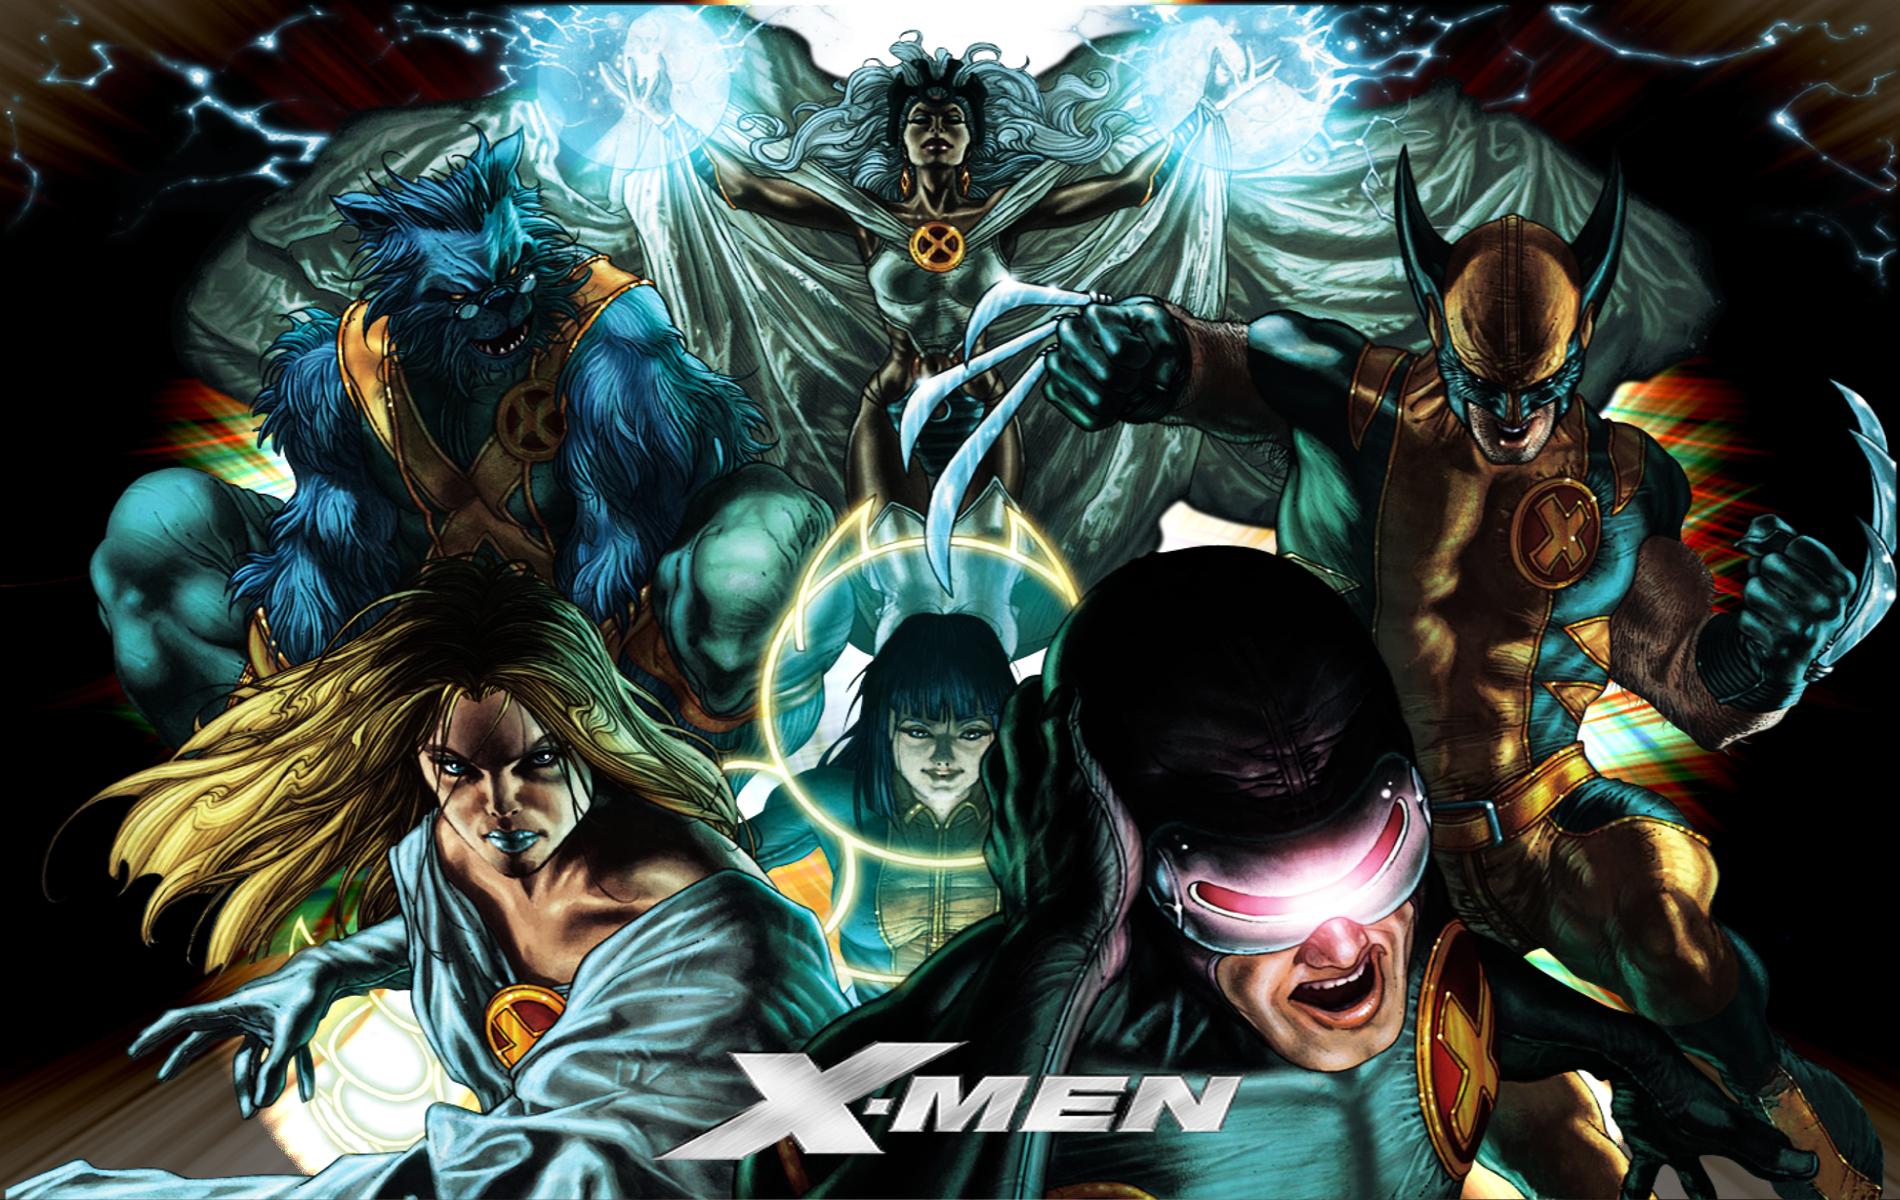 Astonishing X Men artwork by Simone Bianchi 2010Wallpaper 1900x1200